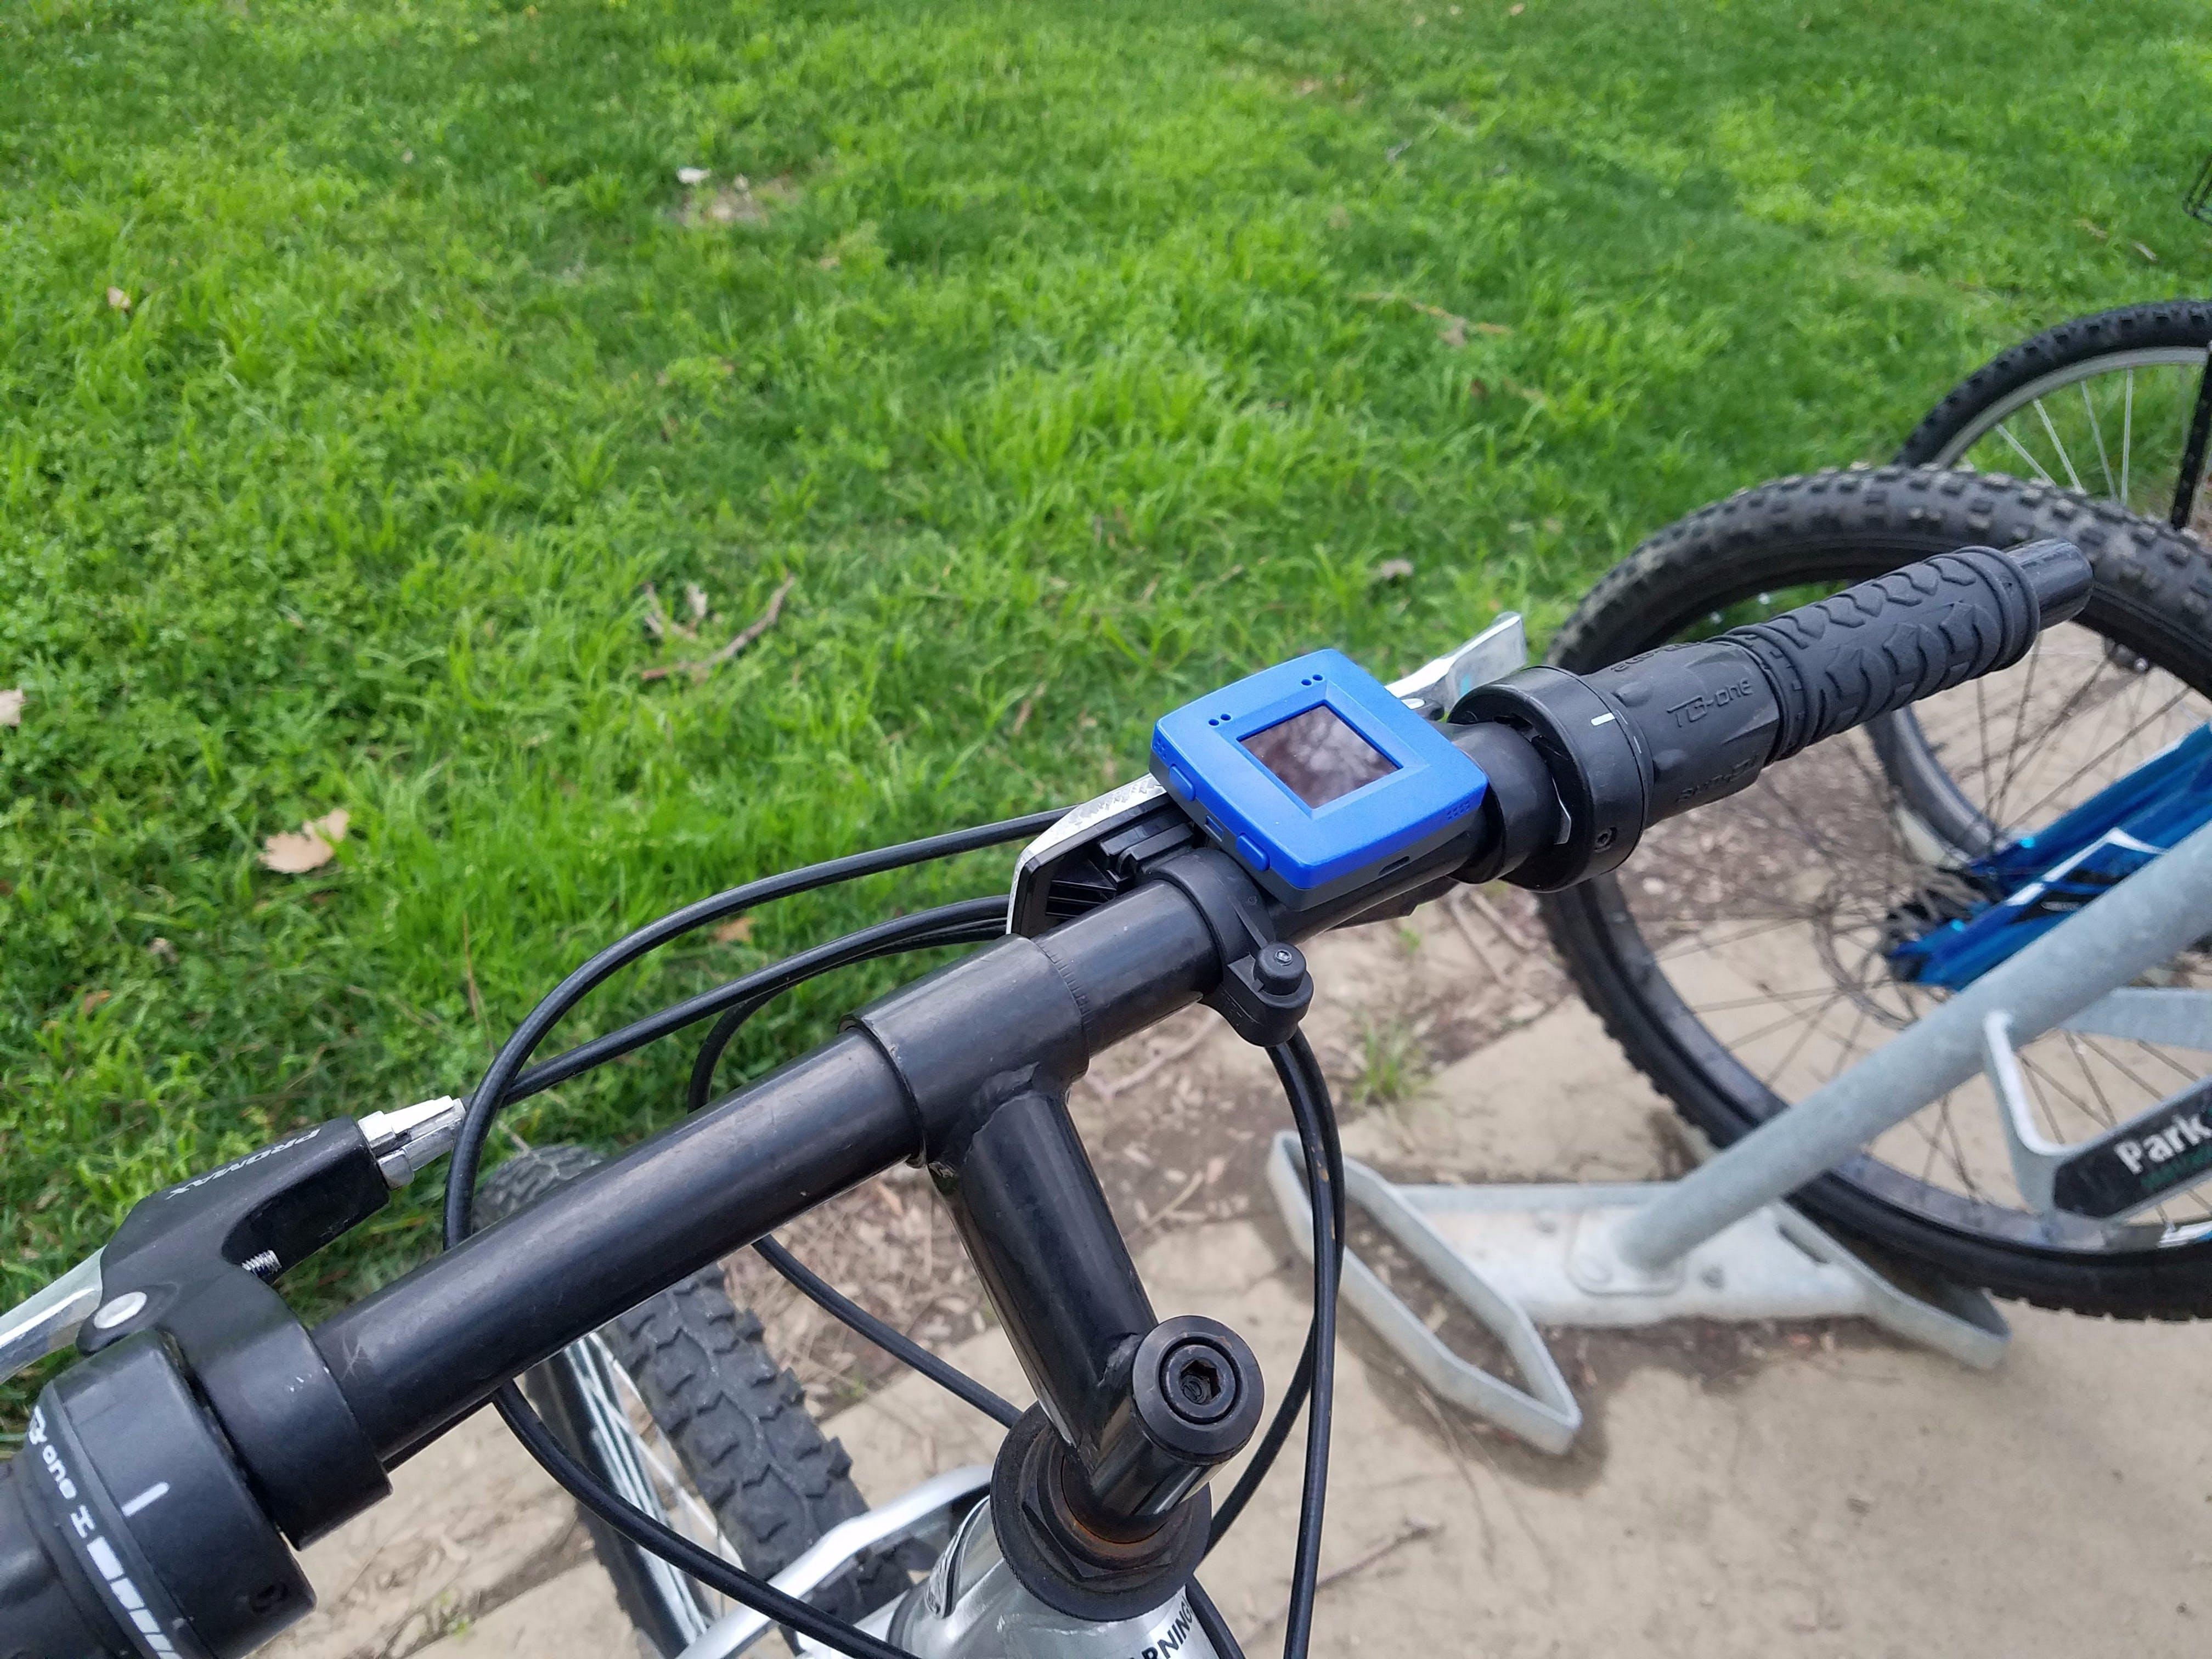 Bike Mounted Journey Tracker